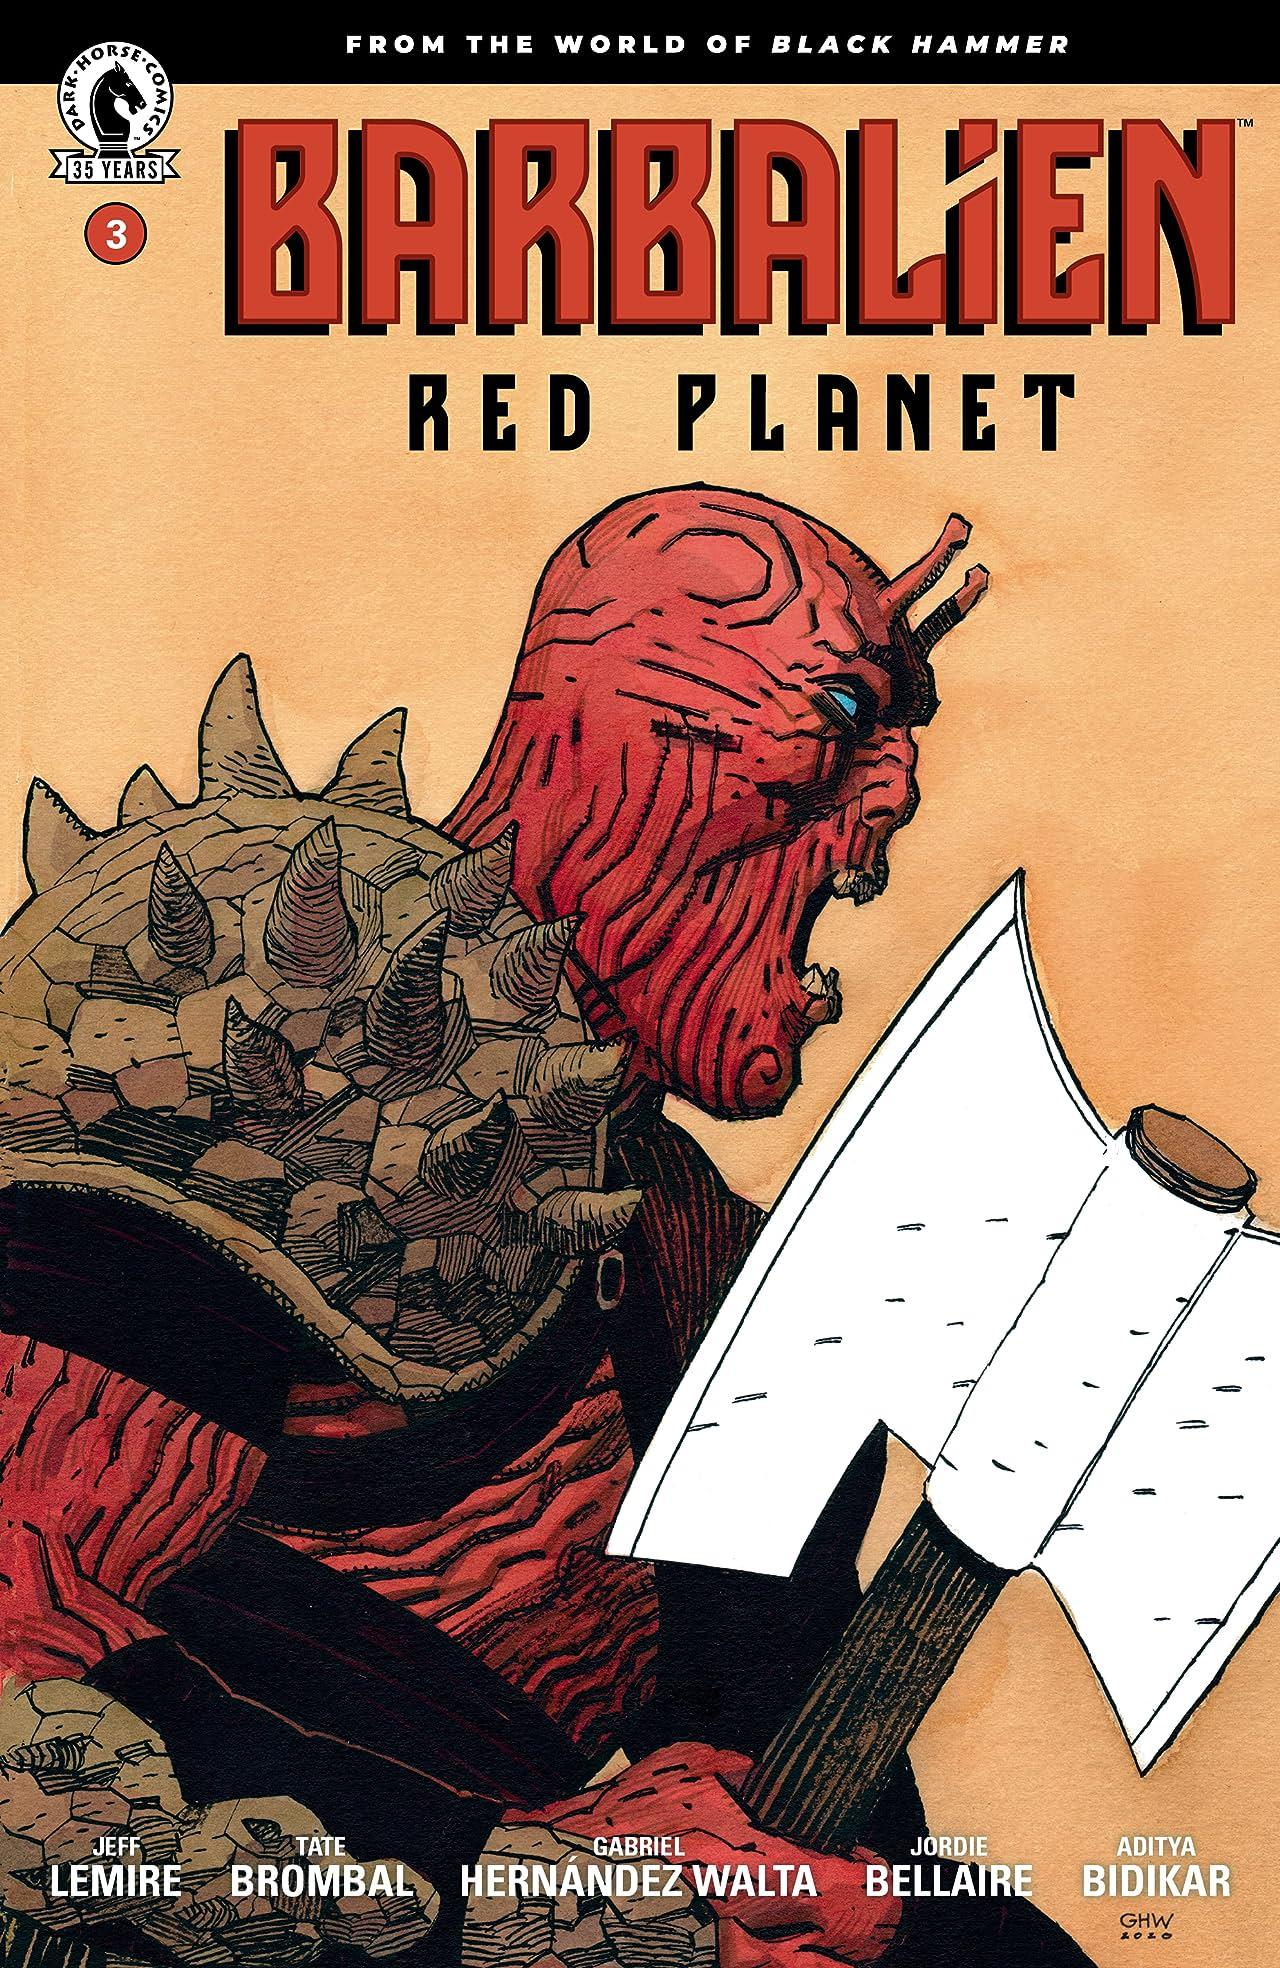 Barbalien: Red Planet #3